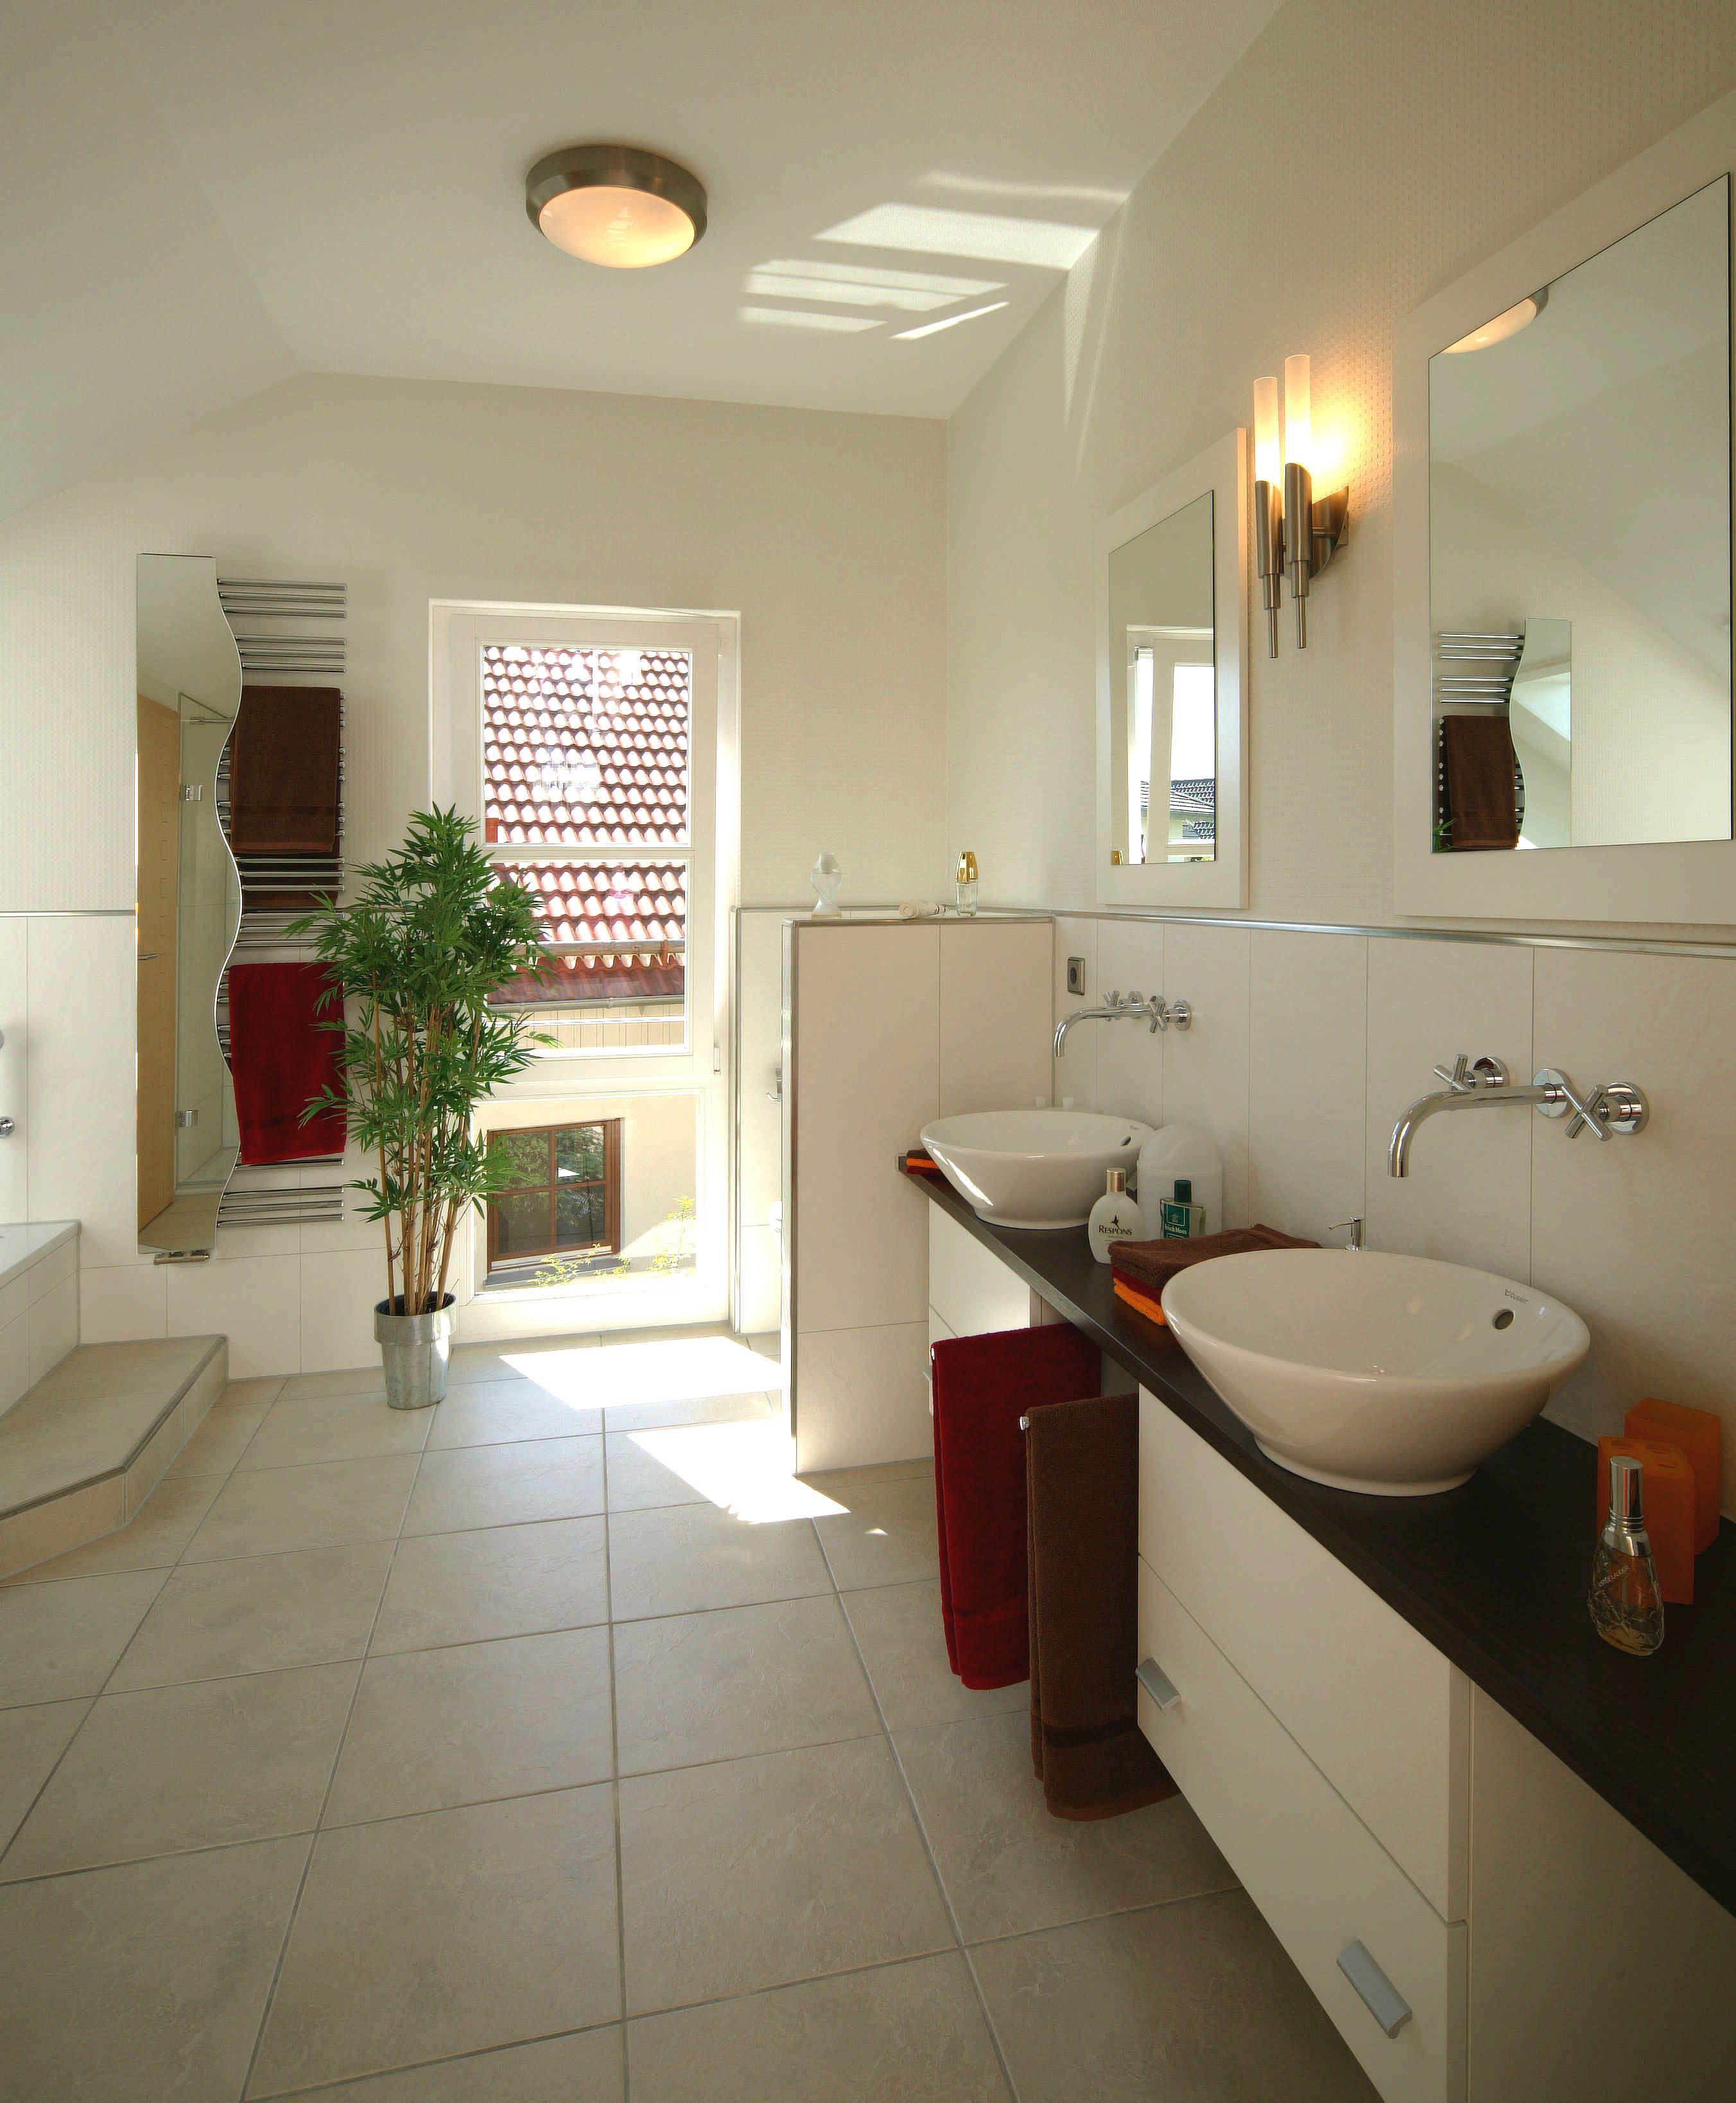 Musterhaus badezimmer  Badezimmer - bathroom - Fertighaus WEISS - Bavaria | Musterhaus ...